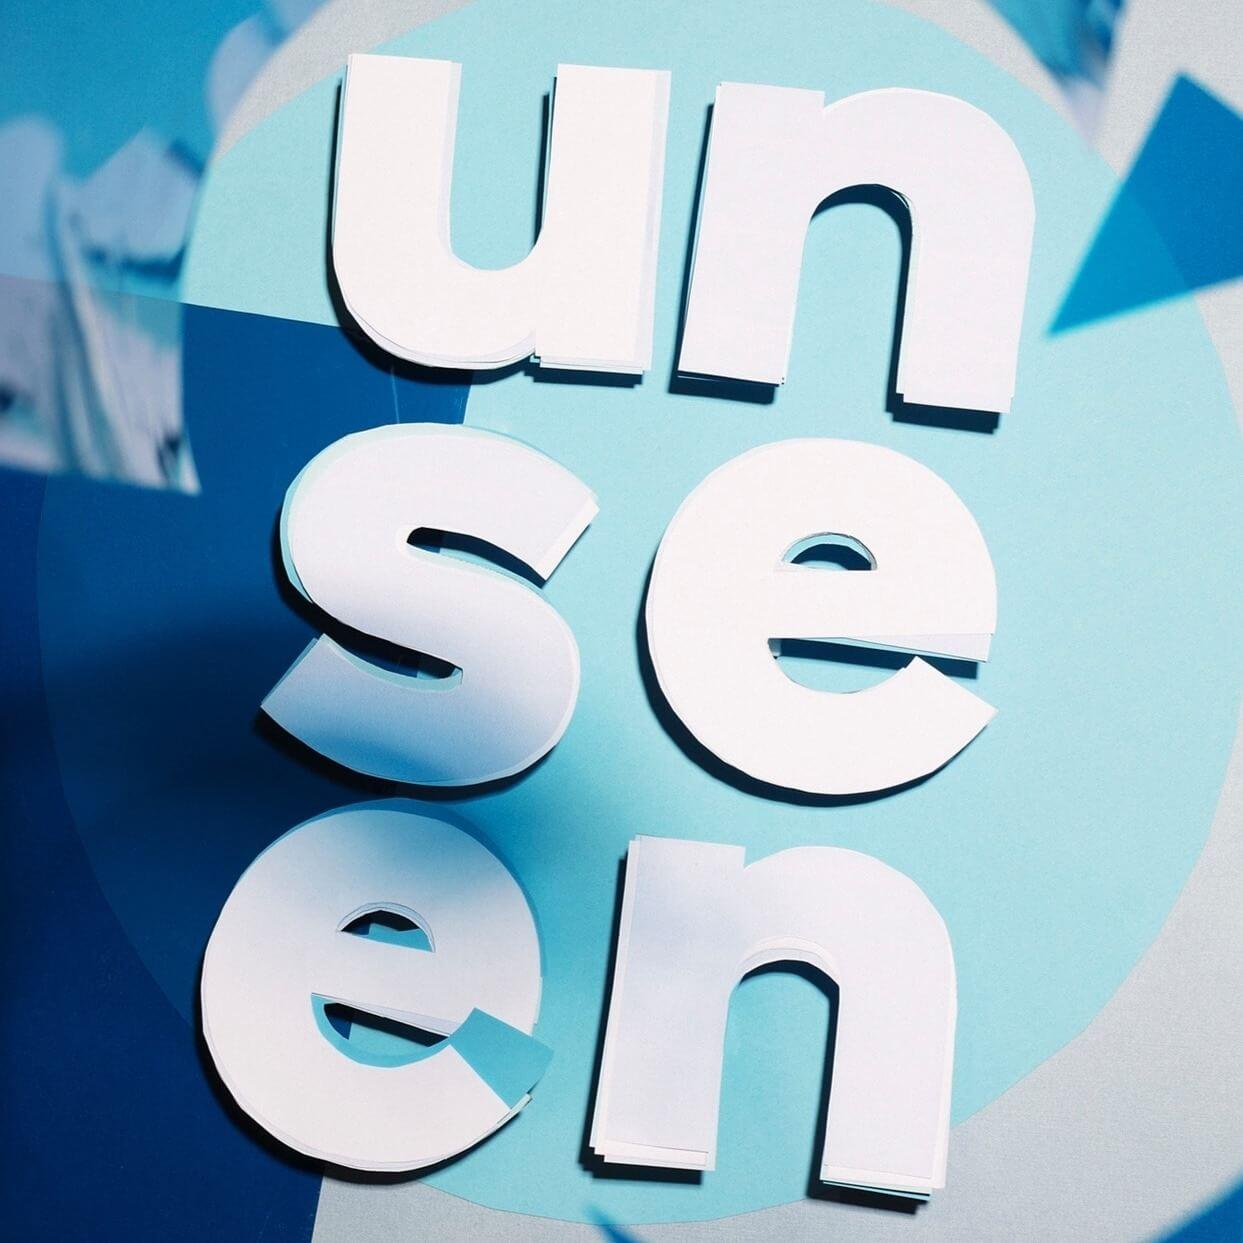 Unseen, Amsterdam